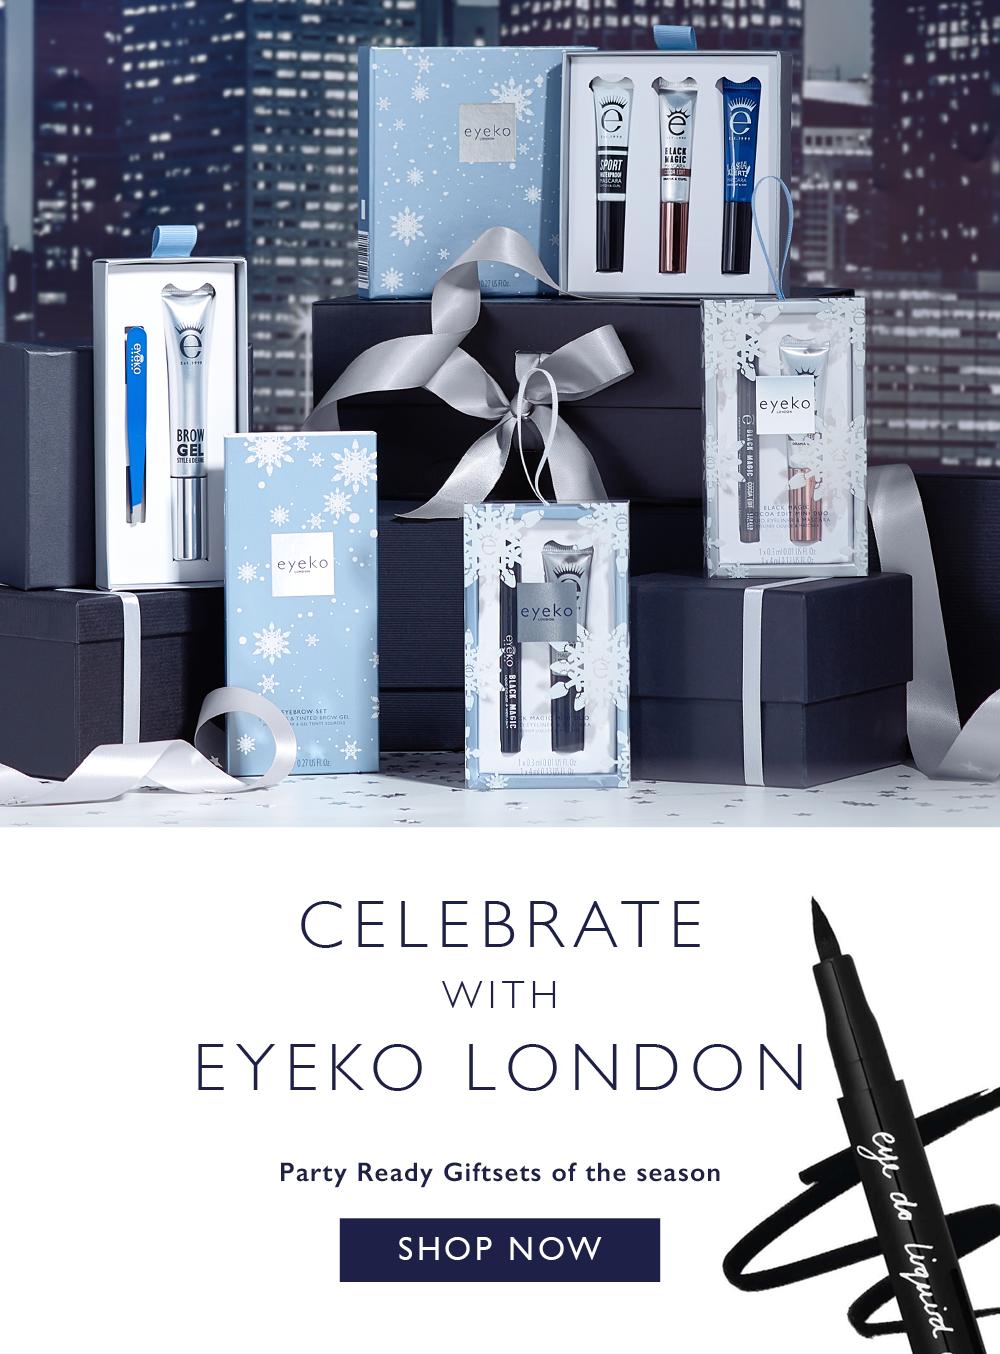 Celebrate the Holiday with Eyeko London